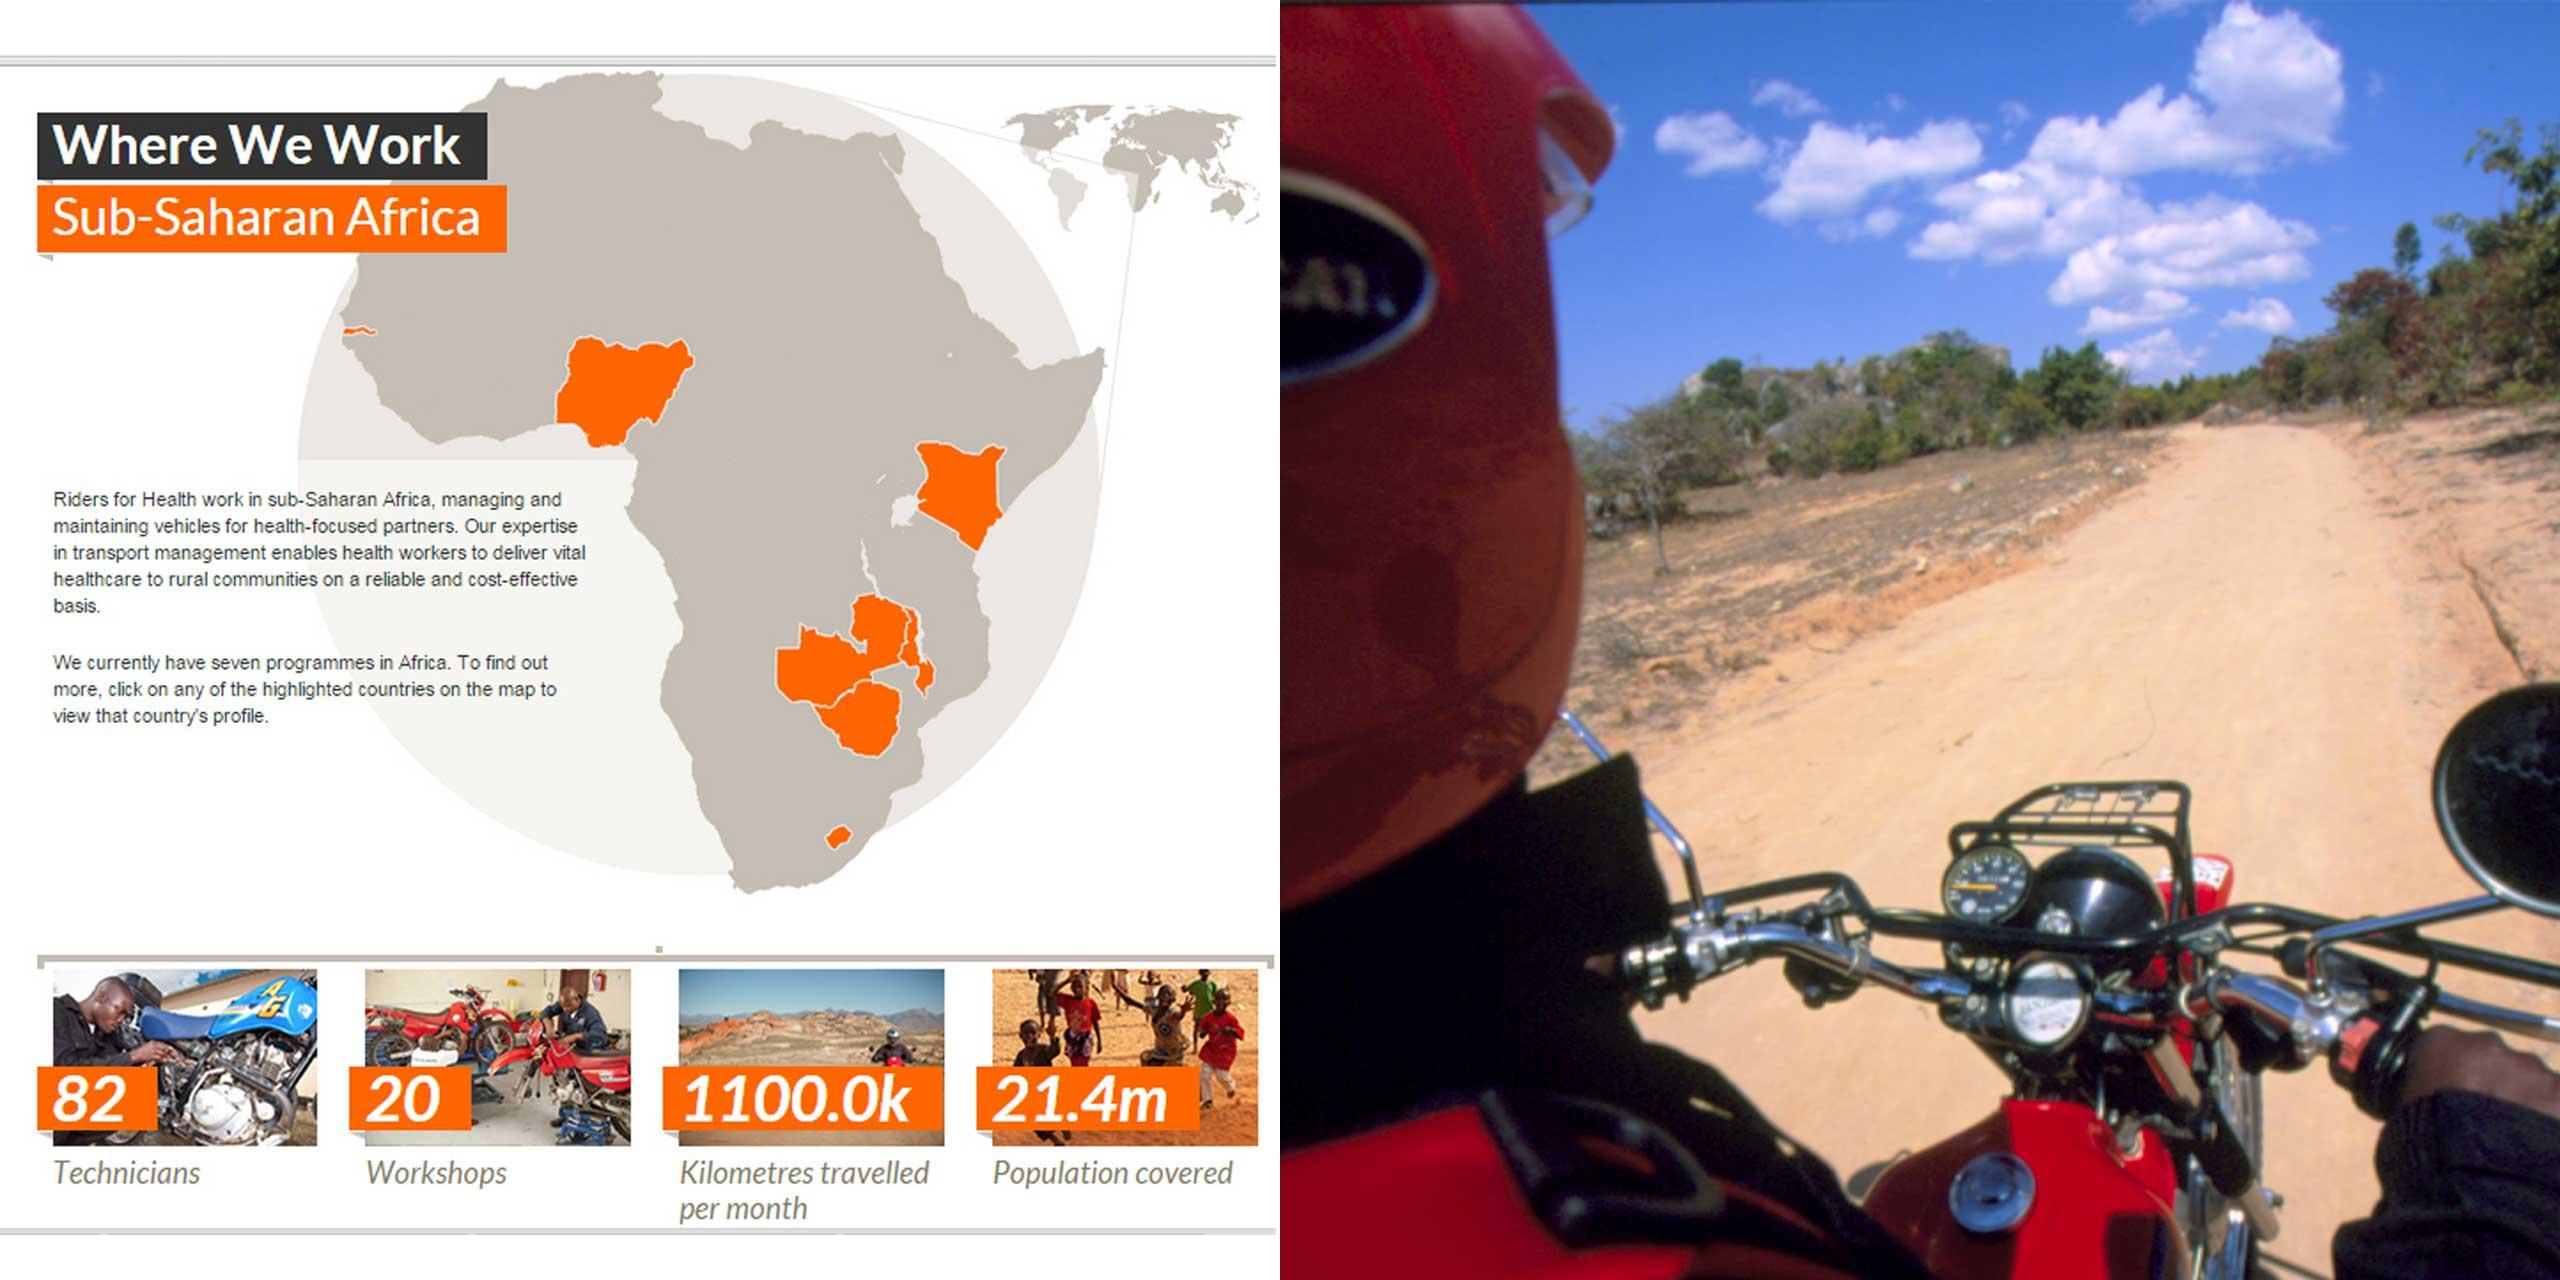 http://skollworldforumorg.c.presscdn.com/wp-content/uploads/2014/02/riders-for-health-sl4.jpg